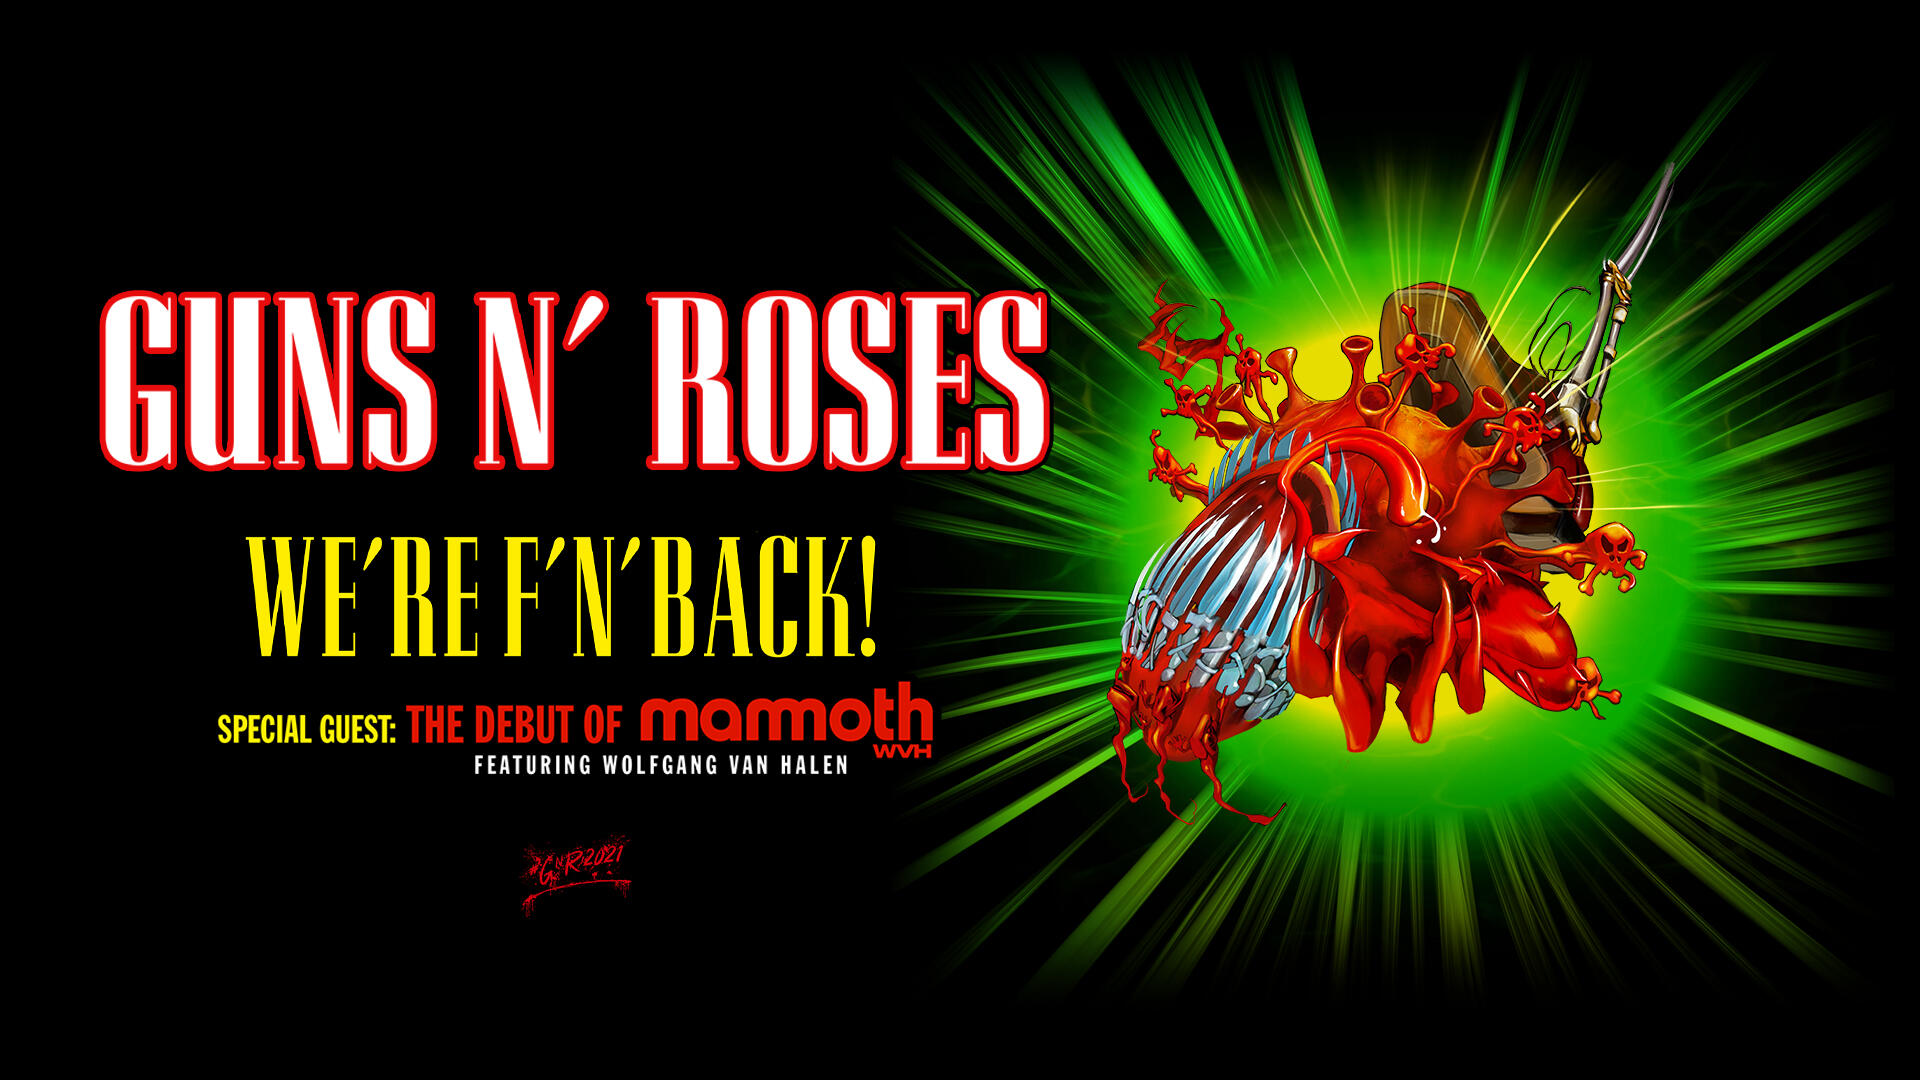 Guns N' Roses 'We're F'N Back!' Tour Coming To MetLife Stadium August 5